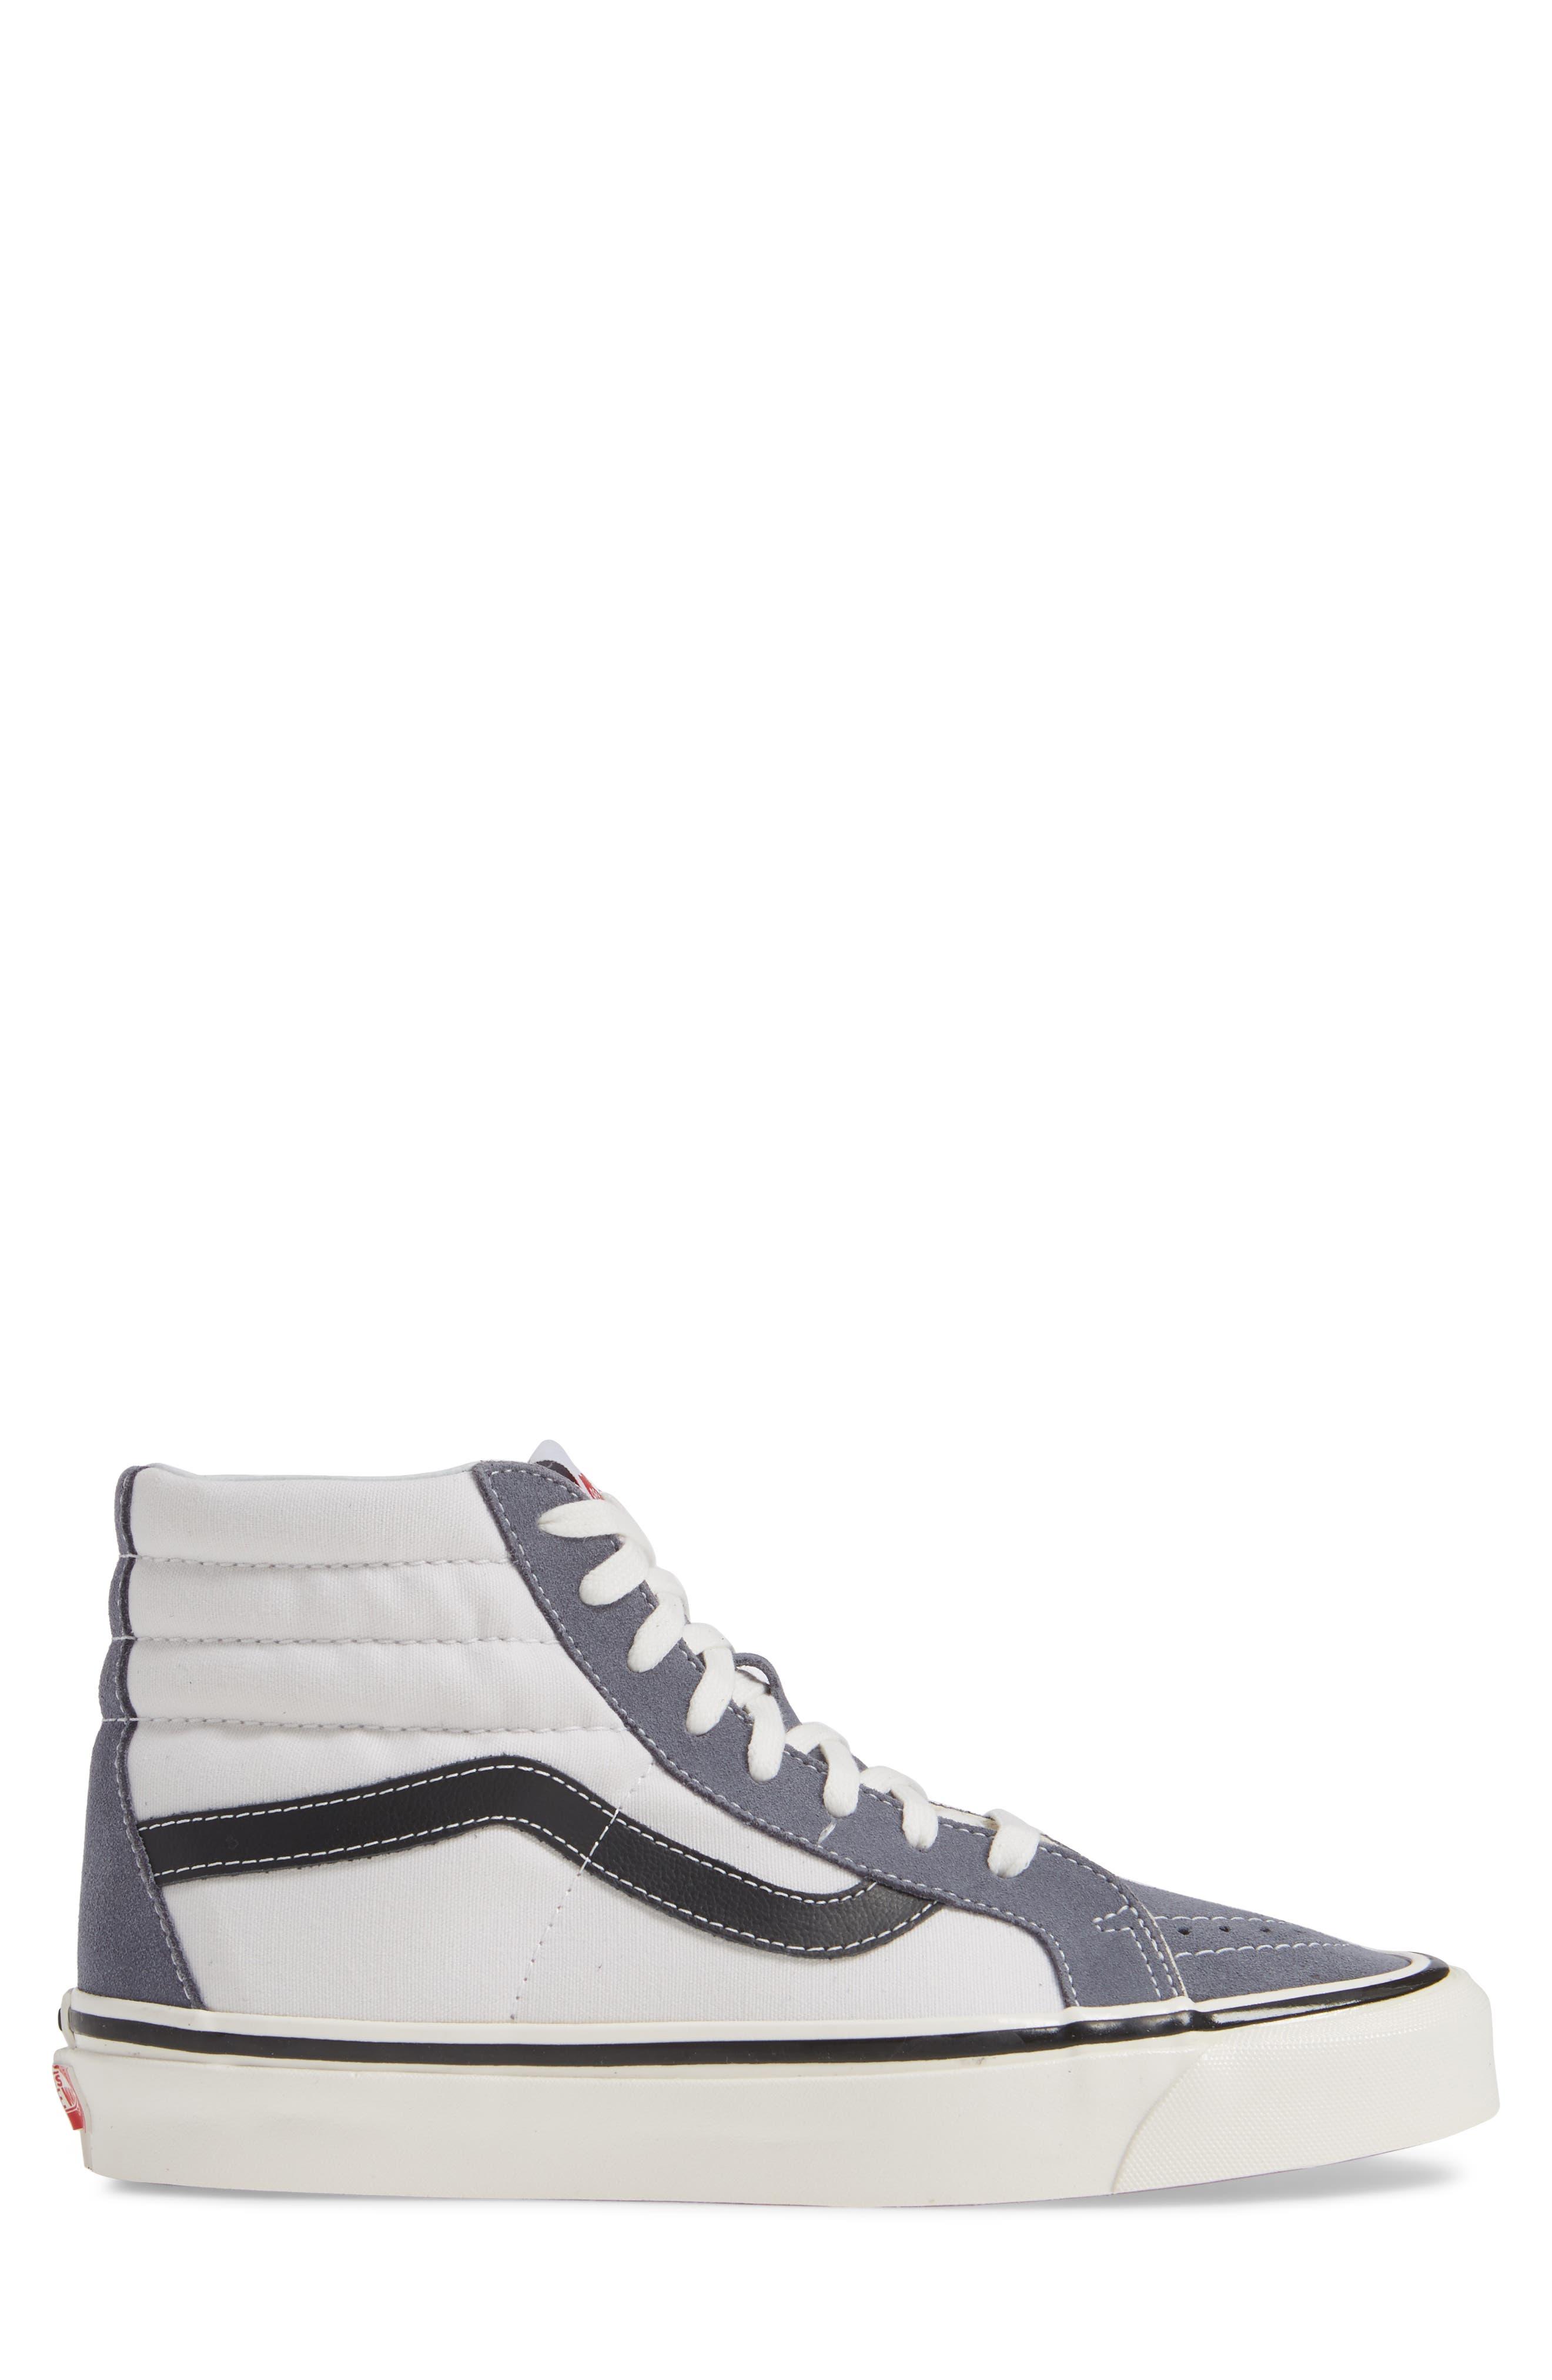 UA Sk8-Hi 38 DX Sneaker,                             Alternate thumbnail 3, color,                             DARK GREY/ WHITE